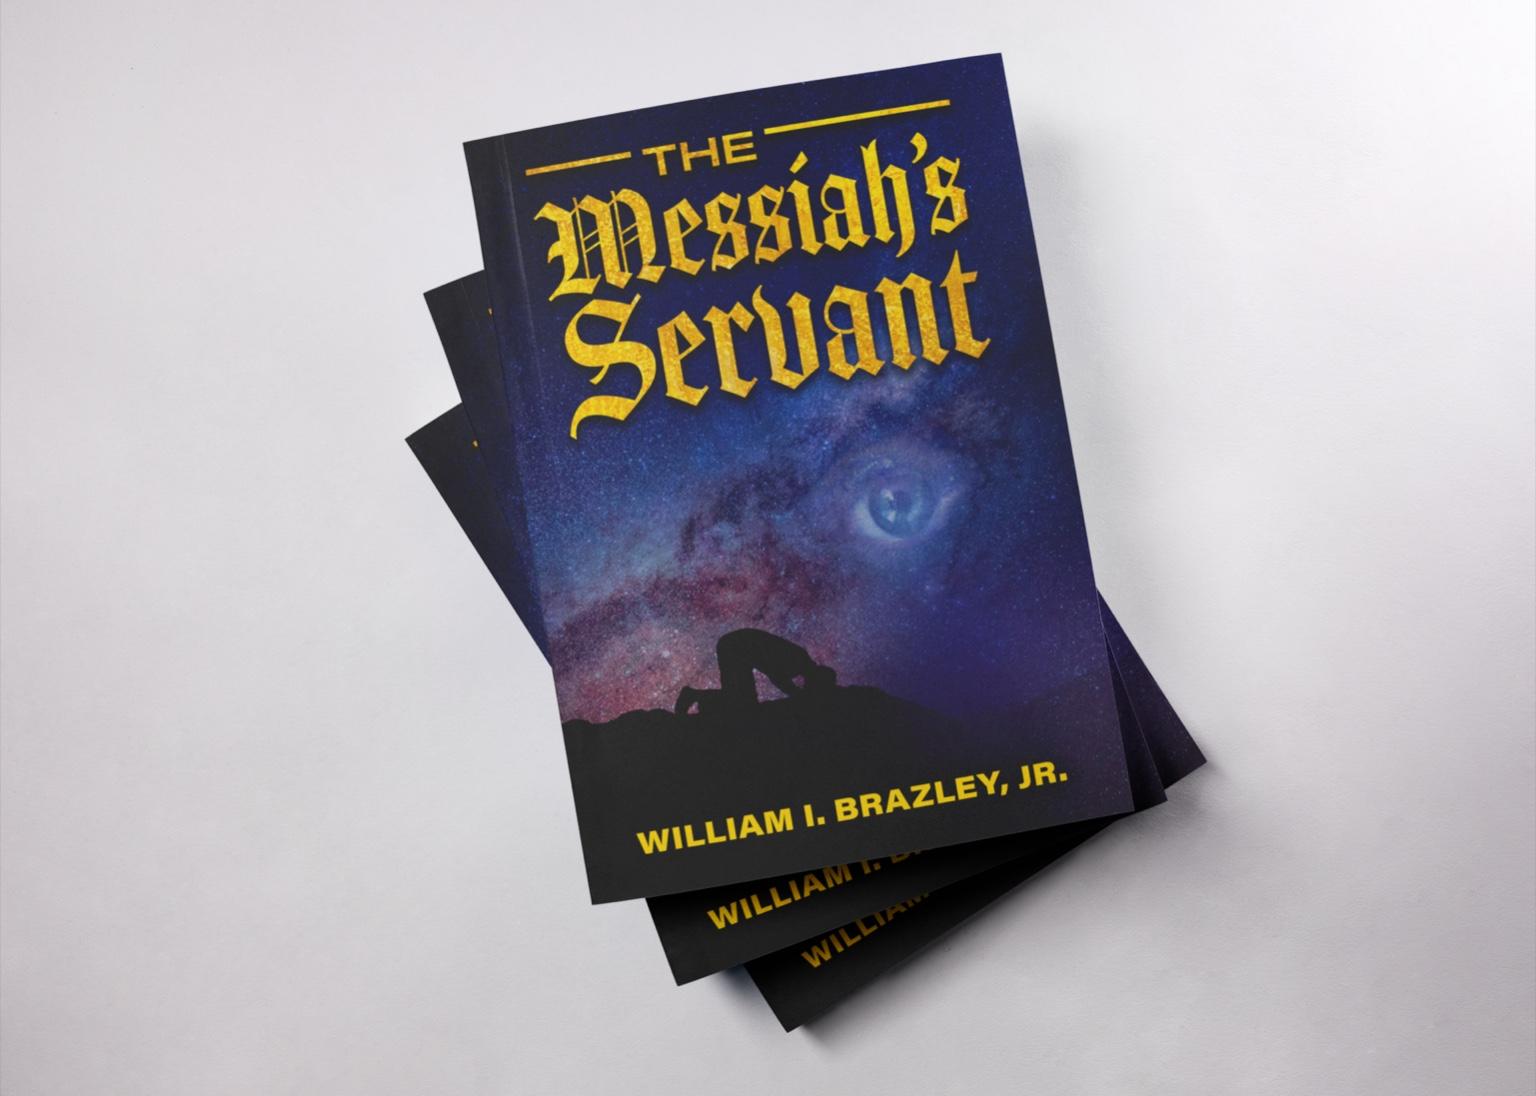 The Messiah's Servant by William I. Brazley, Jr.